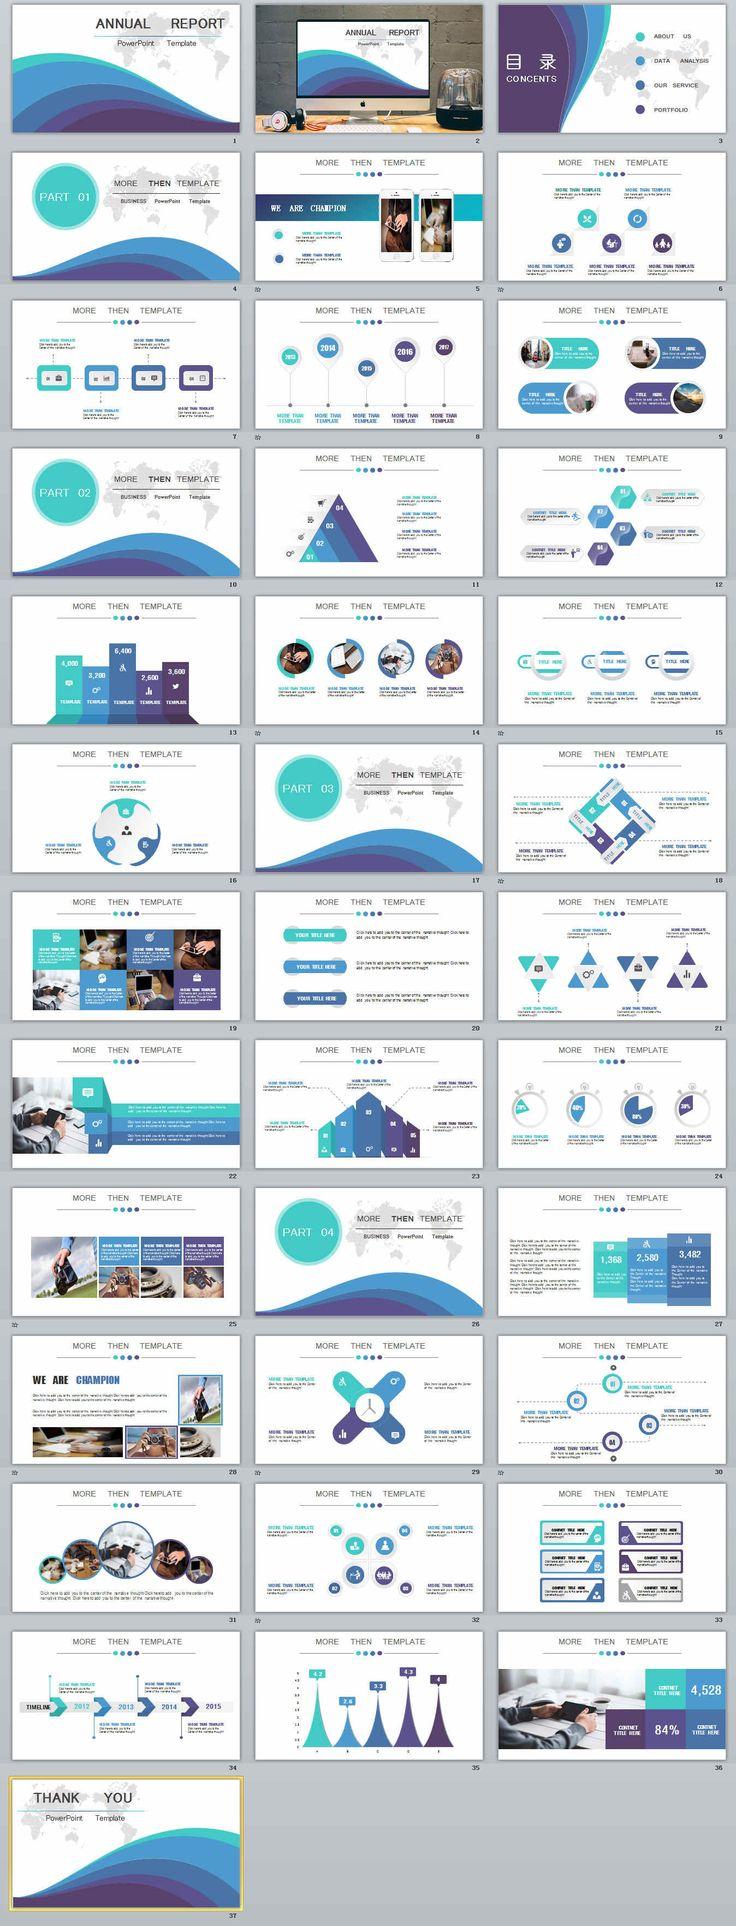 Business infographic 37 annual premium presentation powerpoint description toneelgroepblik Choice Image